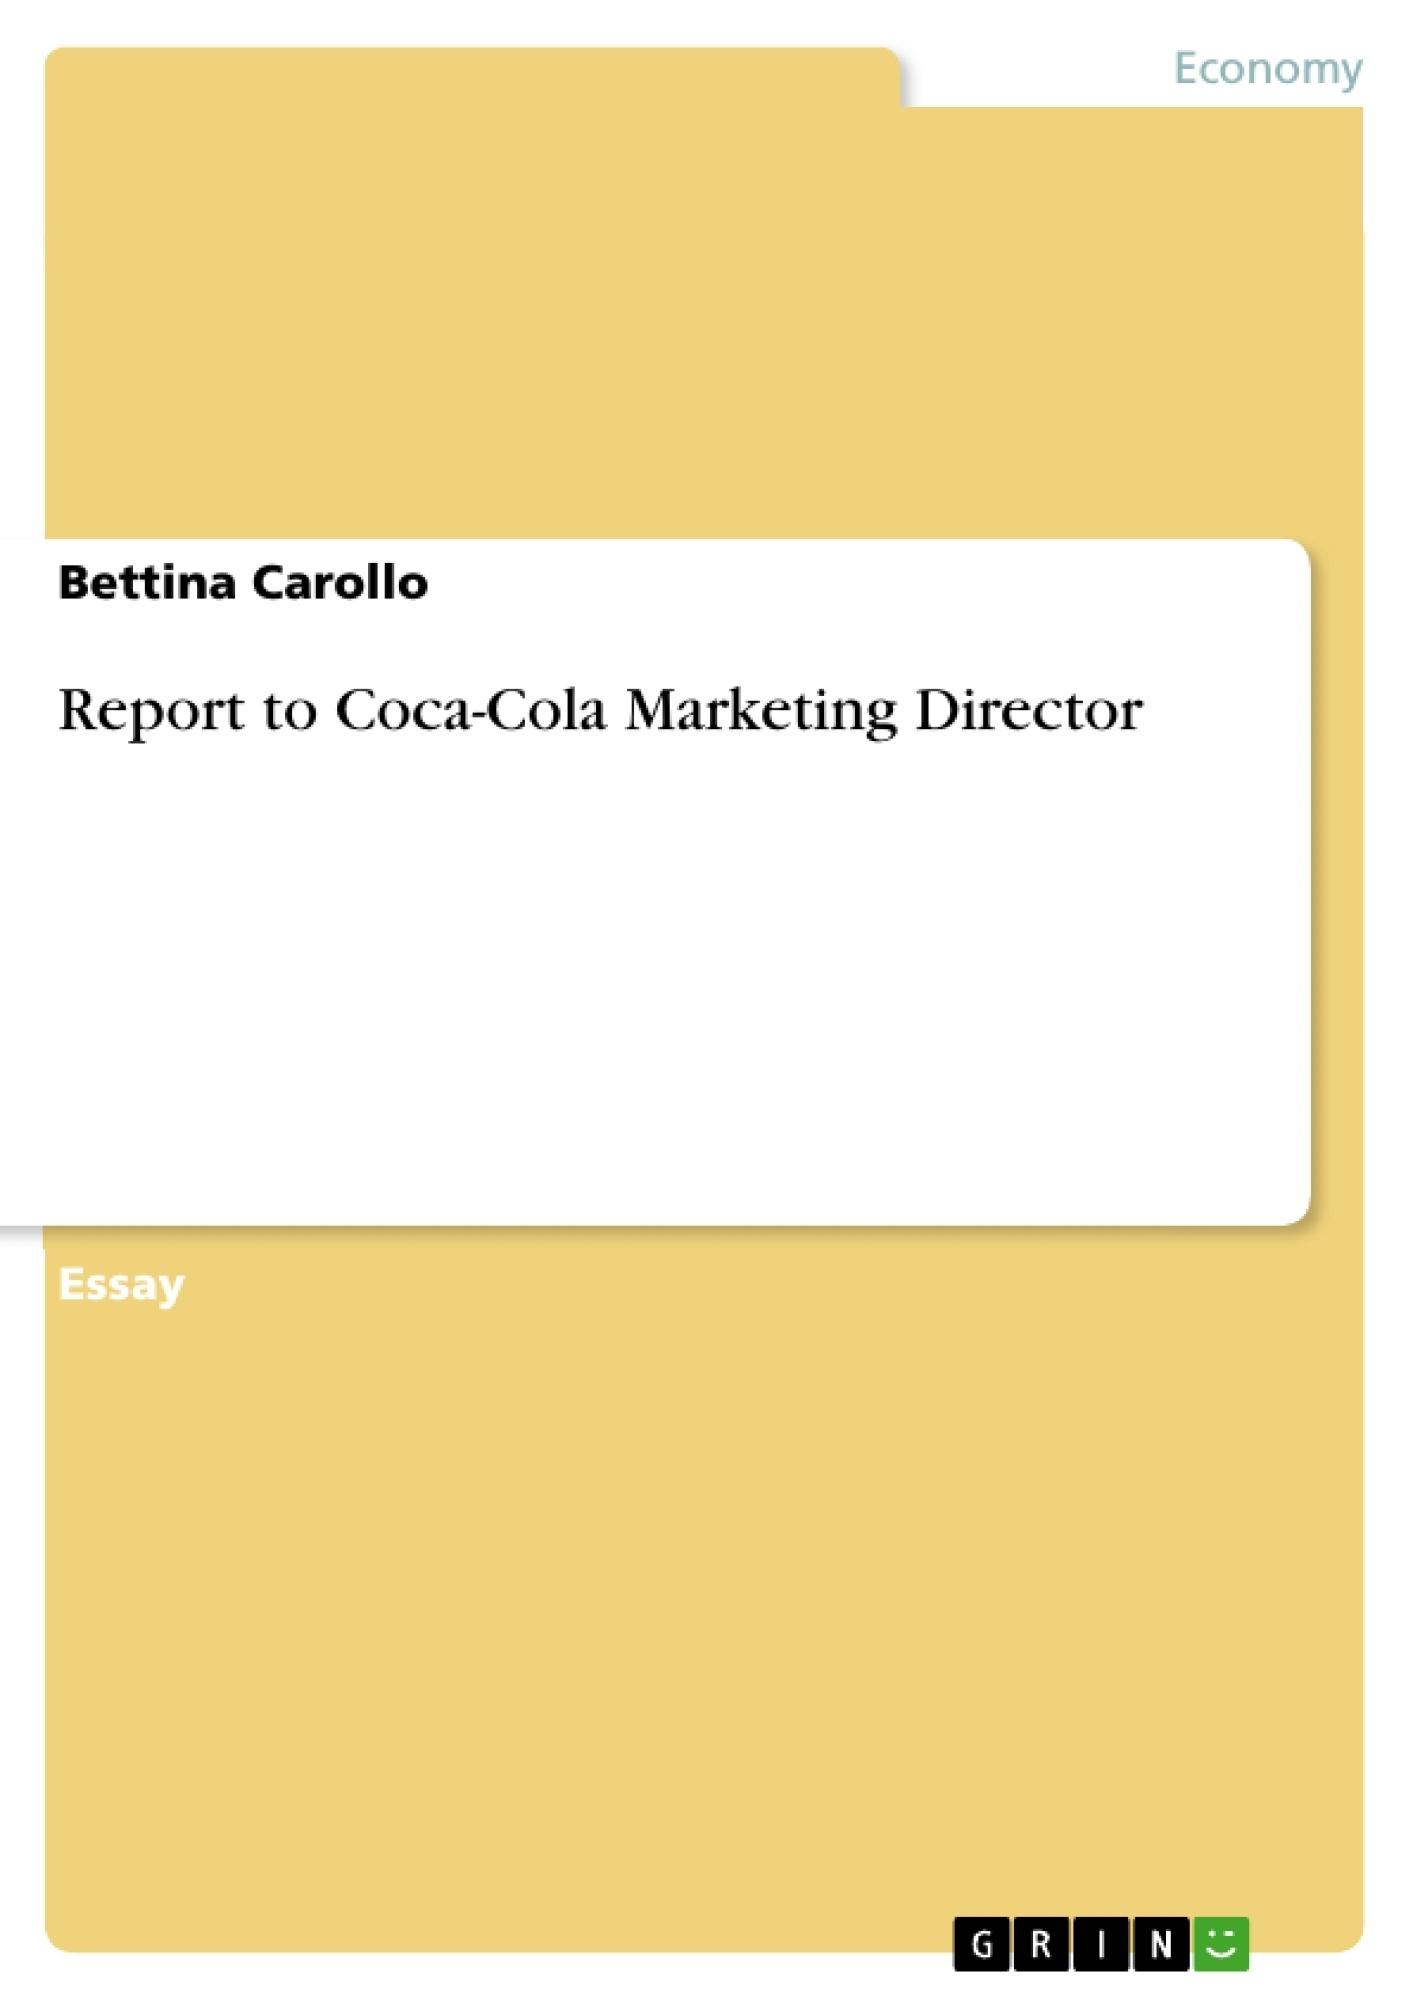 Title: Report to Coca-Cola Marketing Director